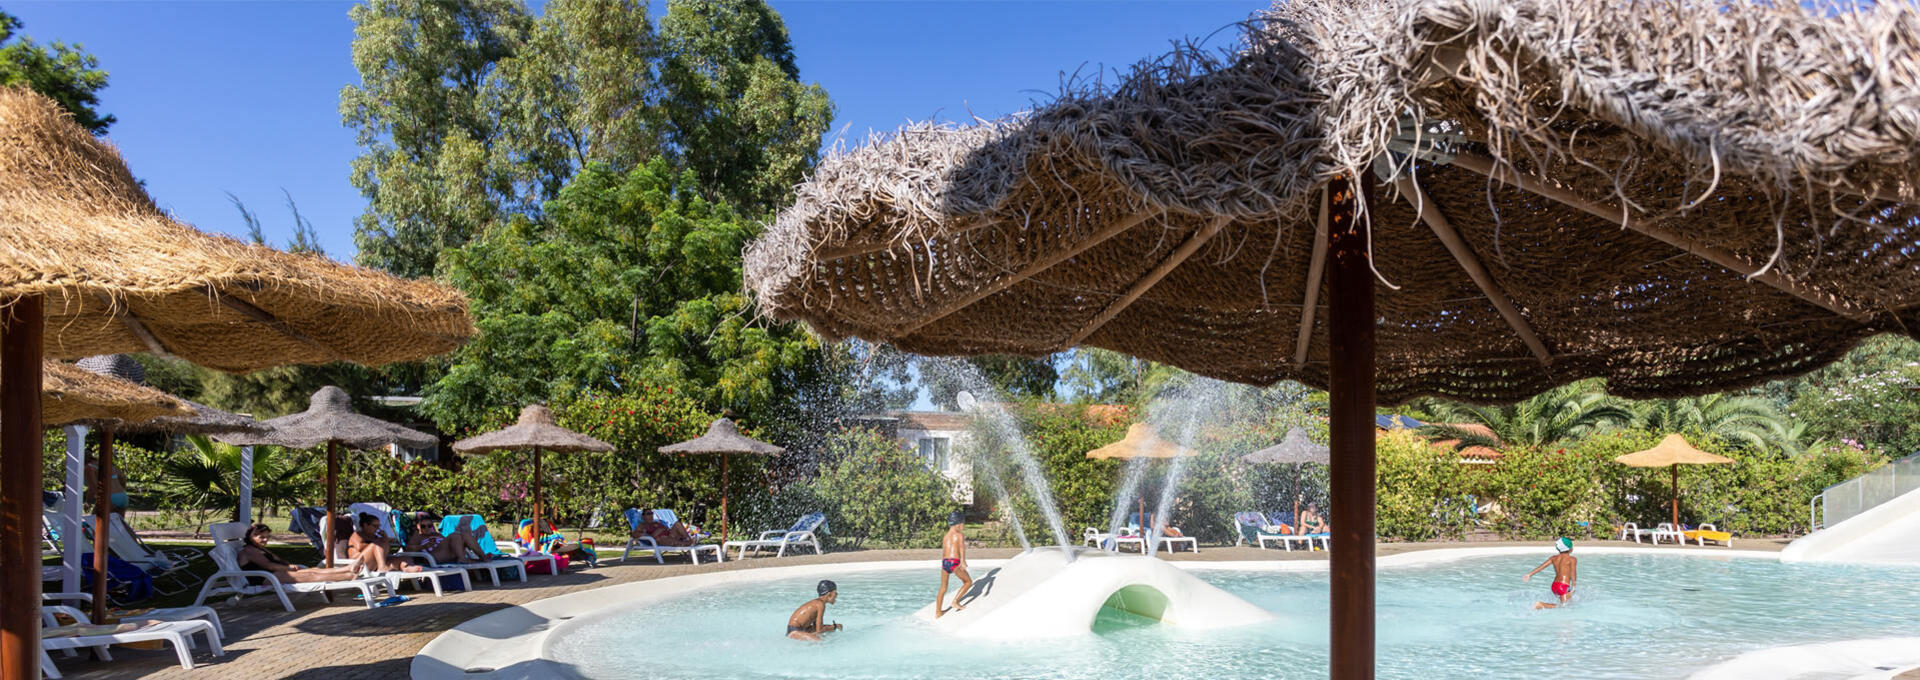 4mori fr village-touristique-avec-piscine-sardaigne 016